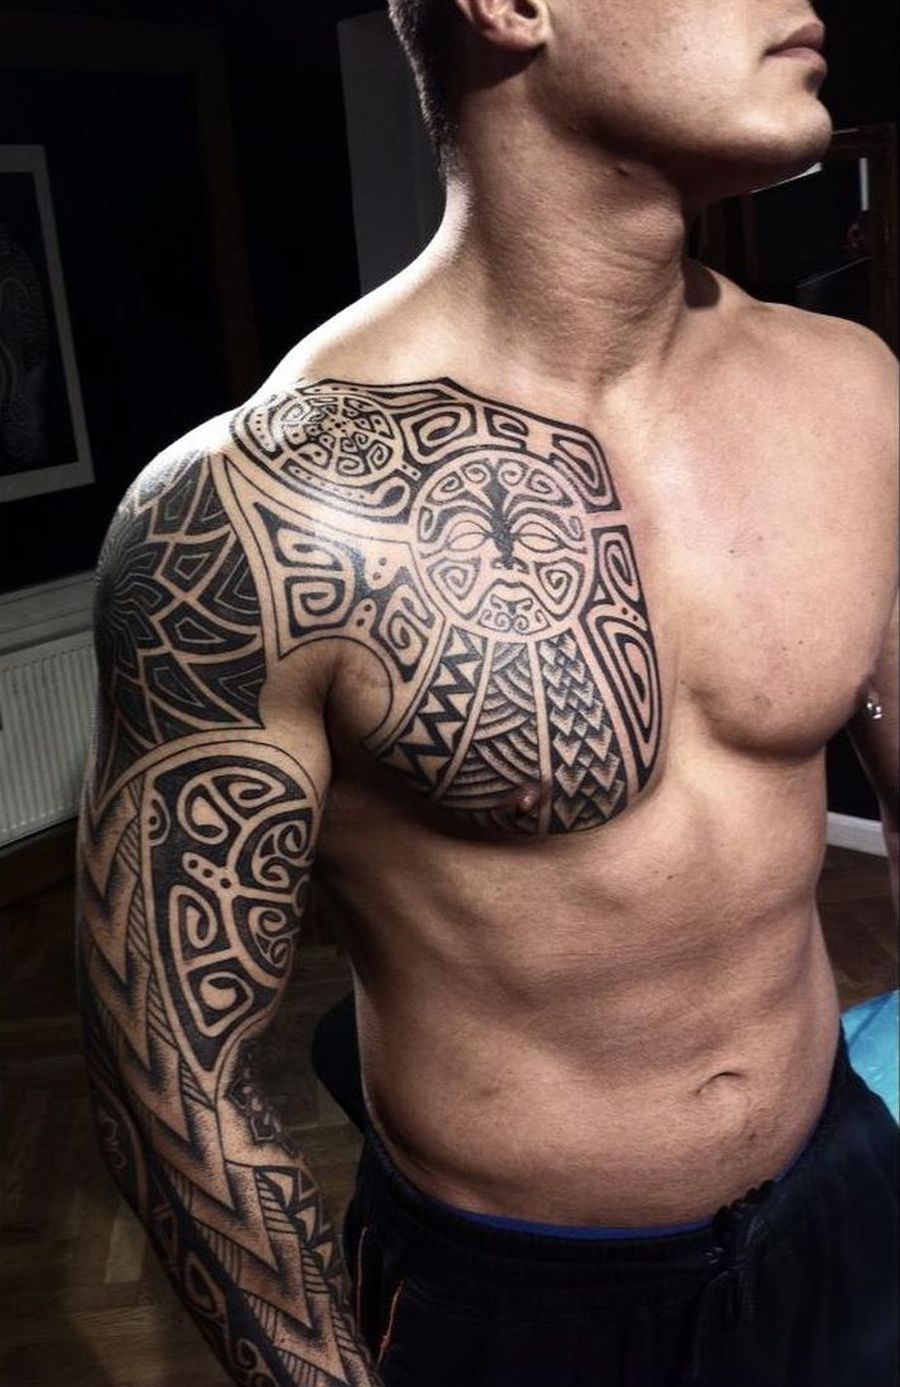 tattoos inspired by Vikings